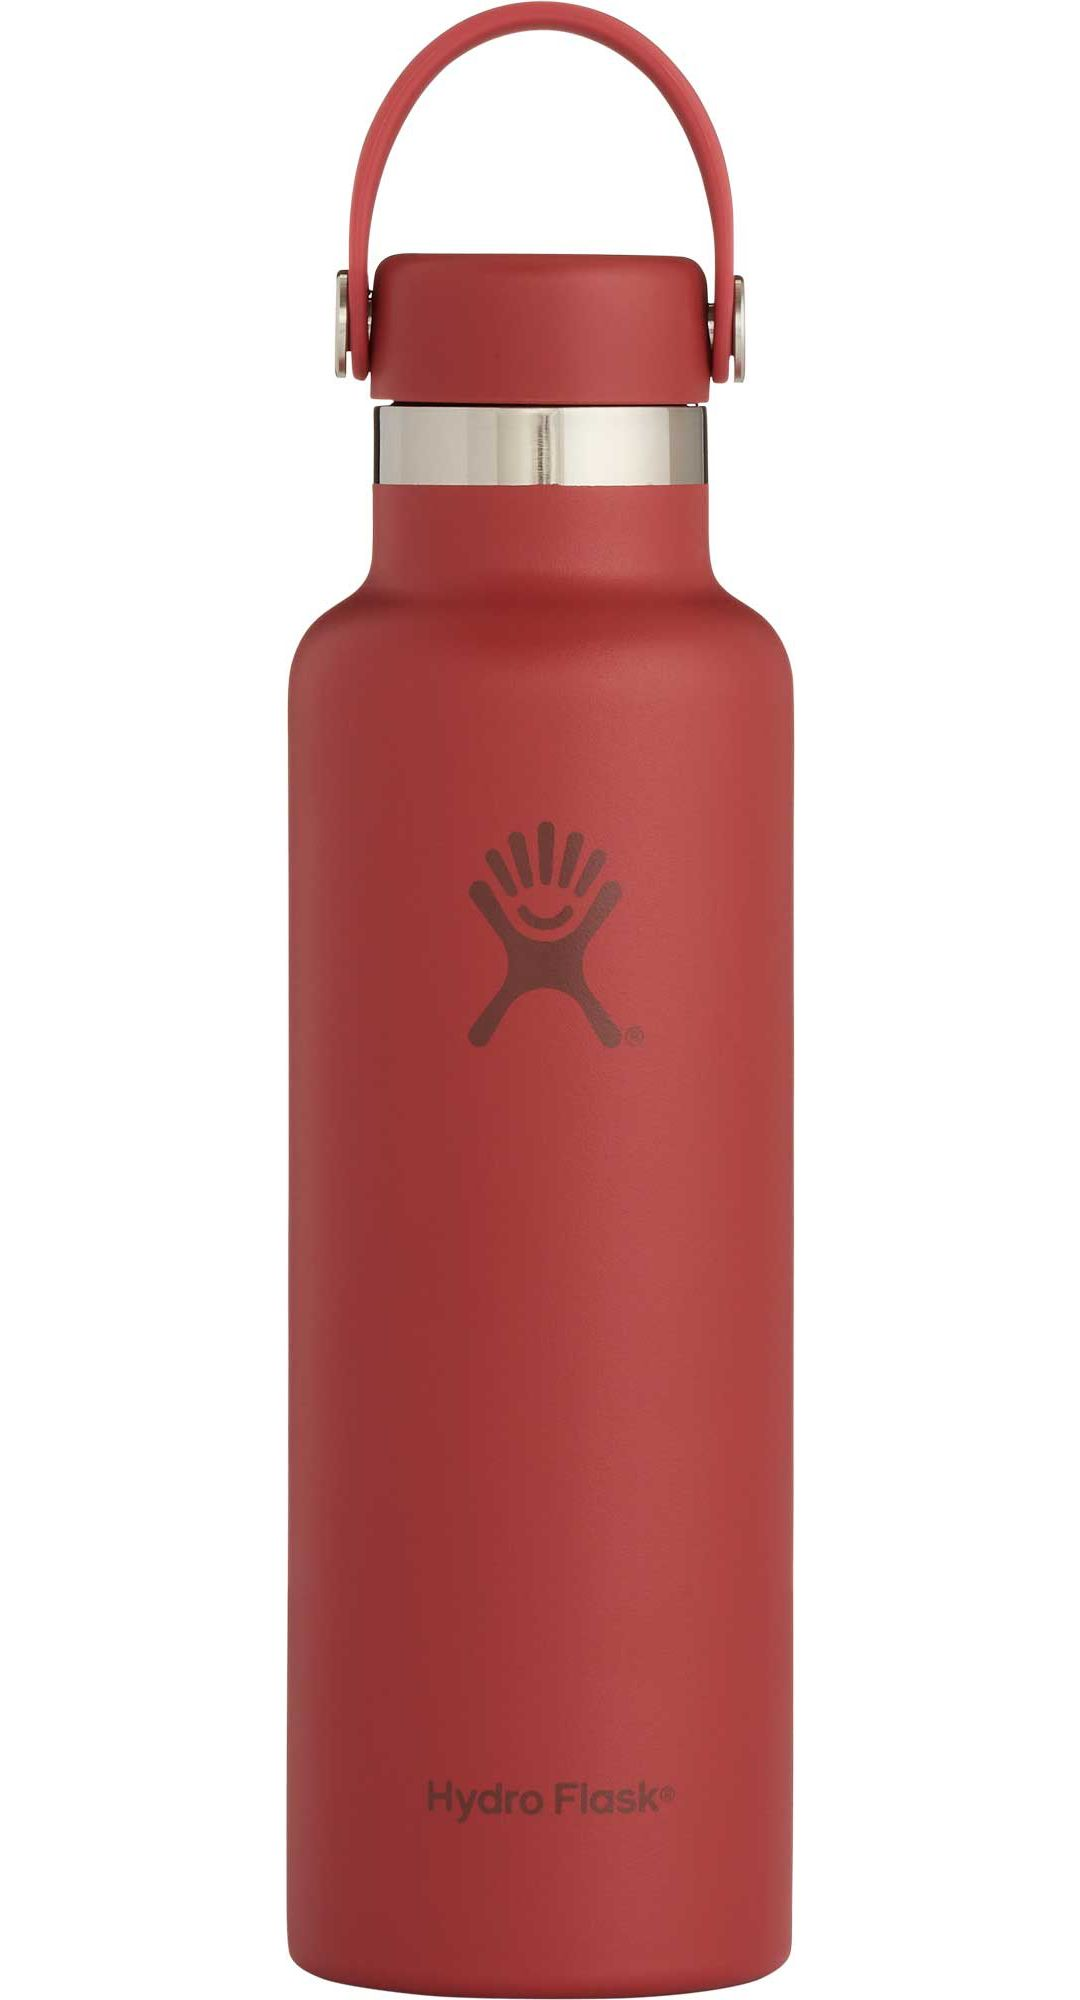 6cd58f47f6 Hydro Flask Skyline Series 21 oz. Standard Mouth Bottle   DICK'S ...